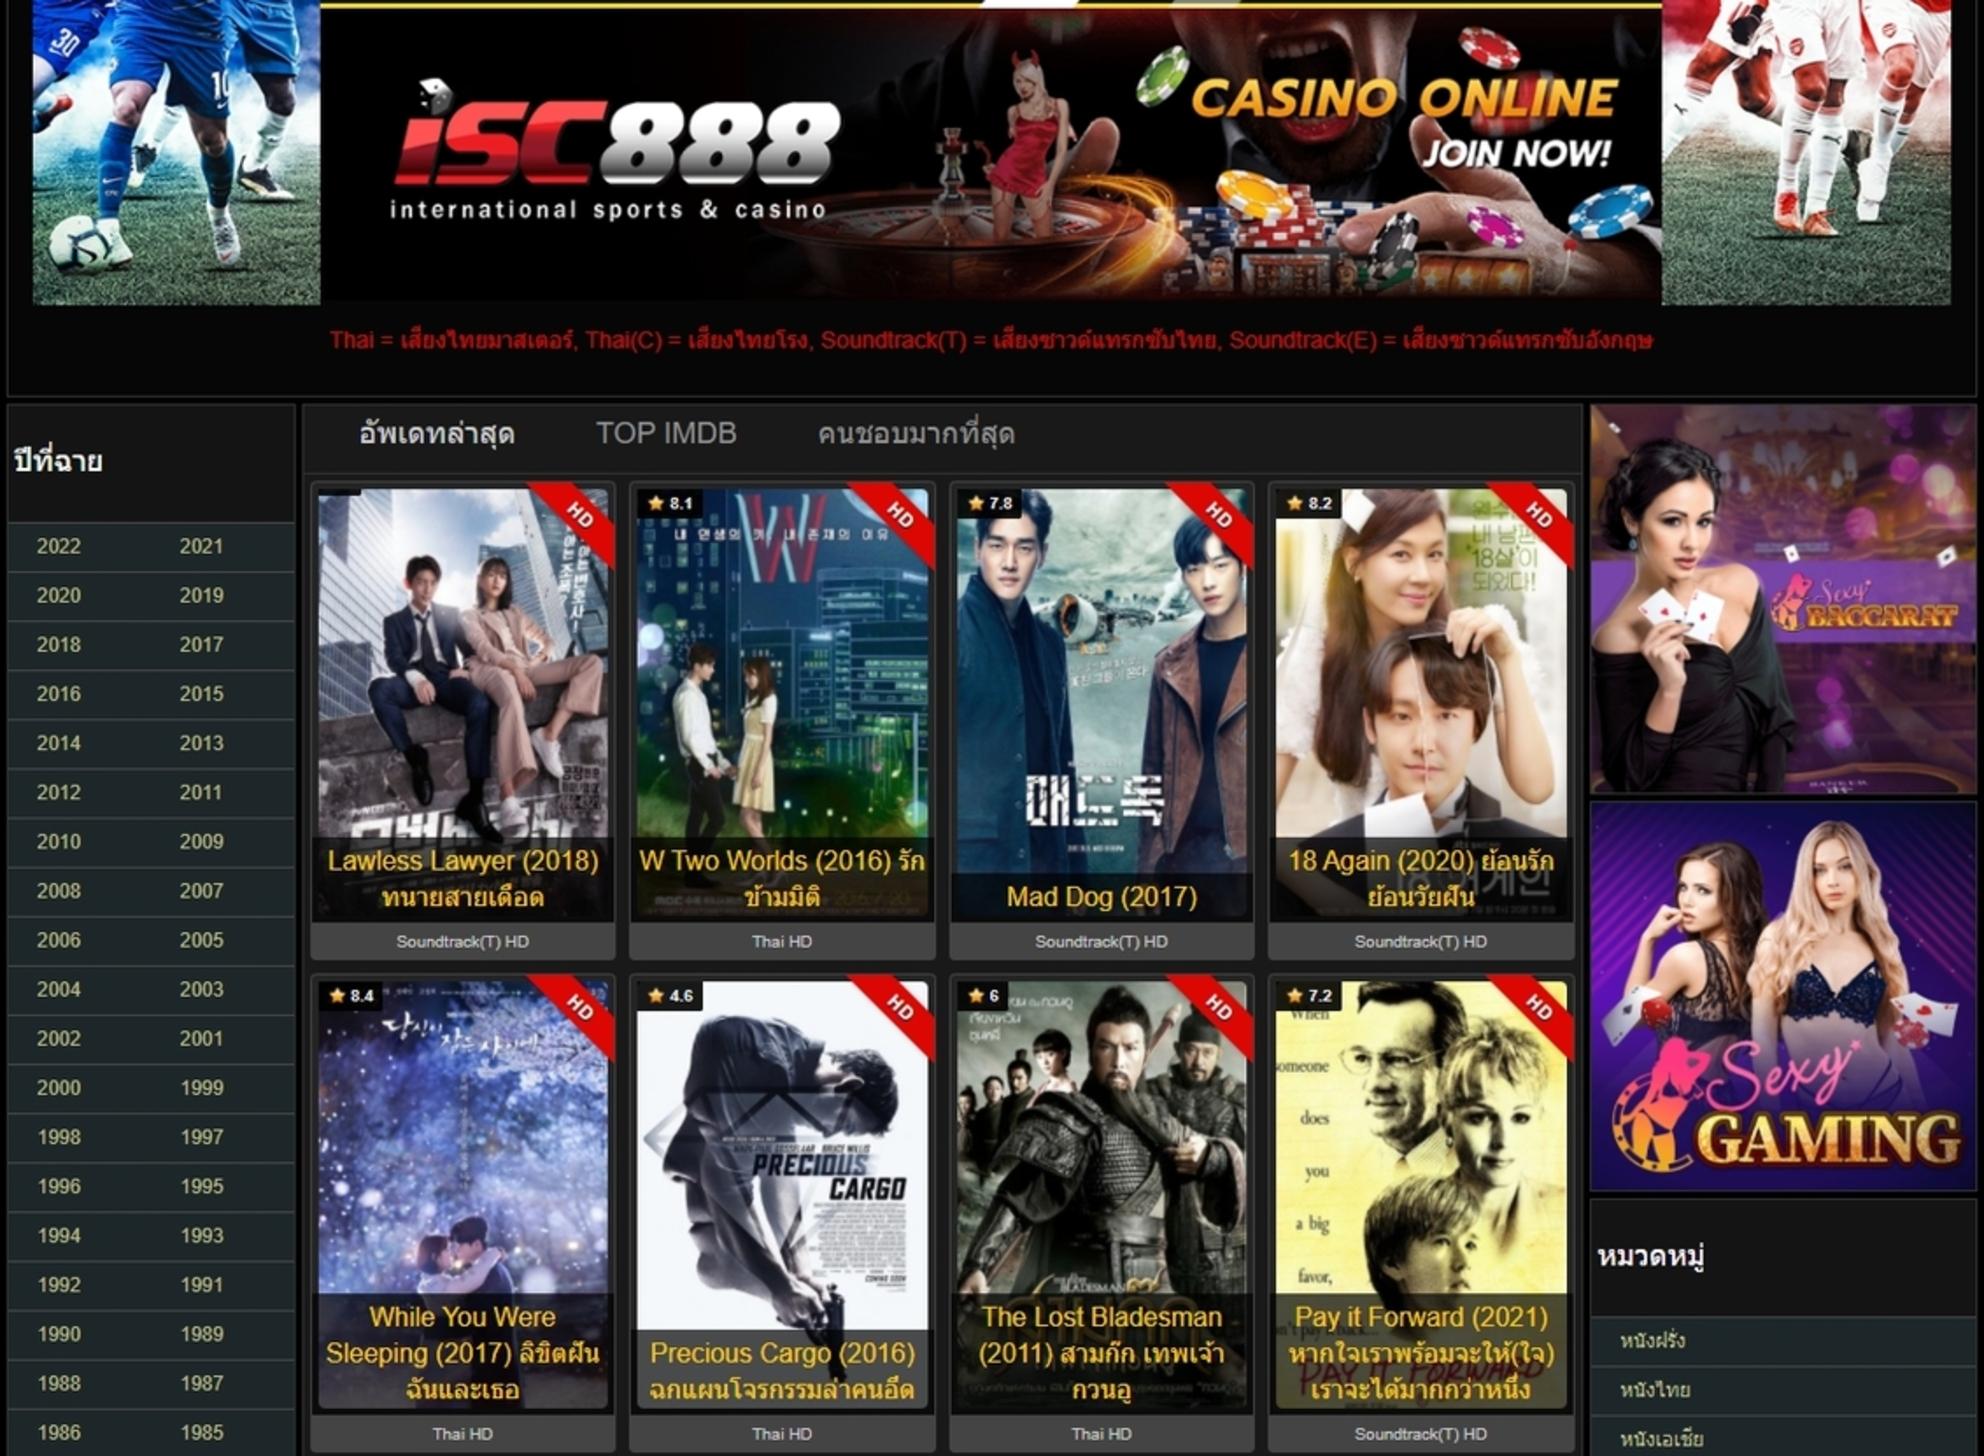 037Moviefree - เว็บดูหนังออนไลน์ฟรี หนังใหม่ชนโรง ... เว็บดูหนังออนไลน์ฟรี 2021 ดูหนังบนมือถือ ไม่ว่าจะเป็นหนังหรือซีรี่ส์ พากย์ไทย ซับไทย หาหนังดุ ไม่รู้ดูเว็บไหน  - foto door Butcher666 op 06-03-2021 - deze foto bevat: abstract, luchtballon, humor, spiegeling, reizen, nacht, urban, nachtfotografie, flitsen, strobist, urban exploring